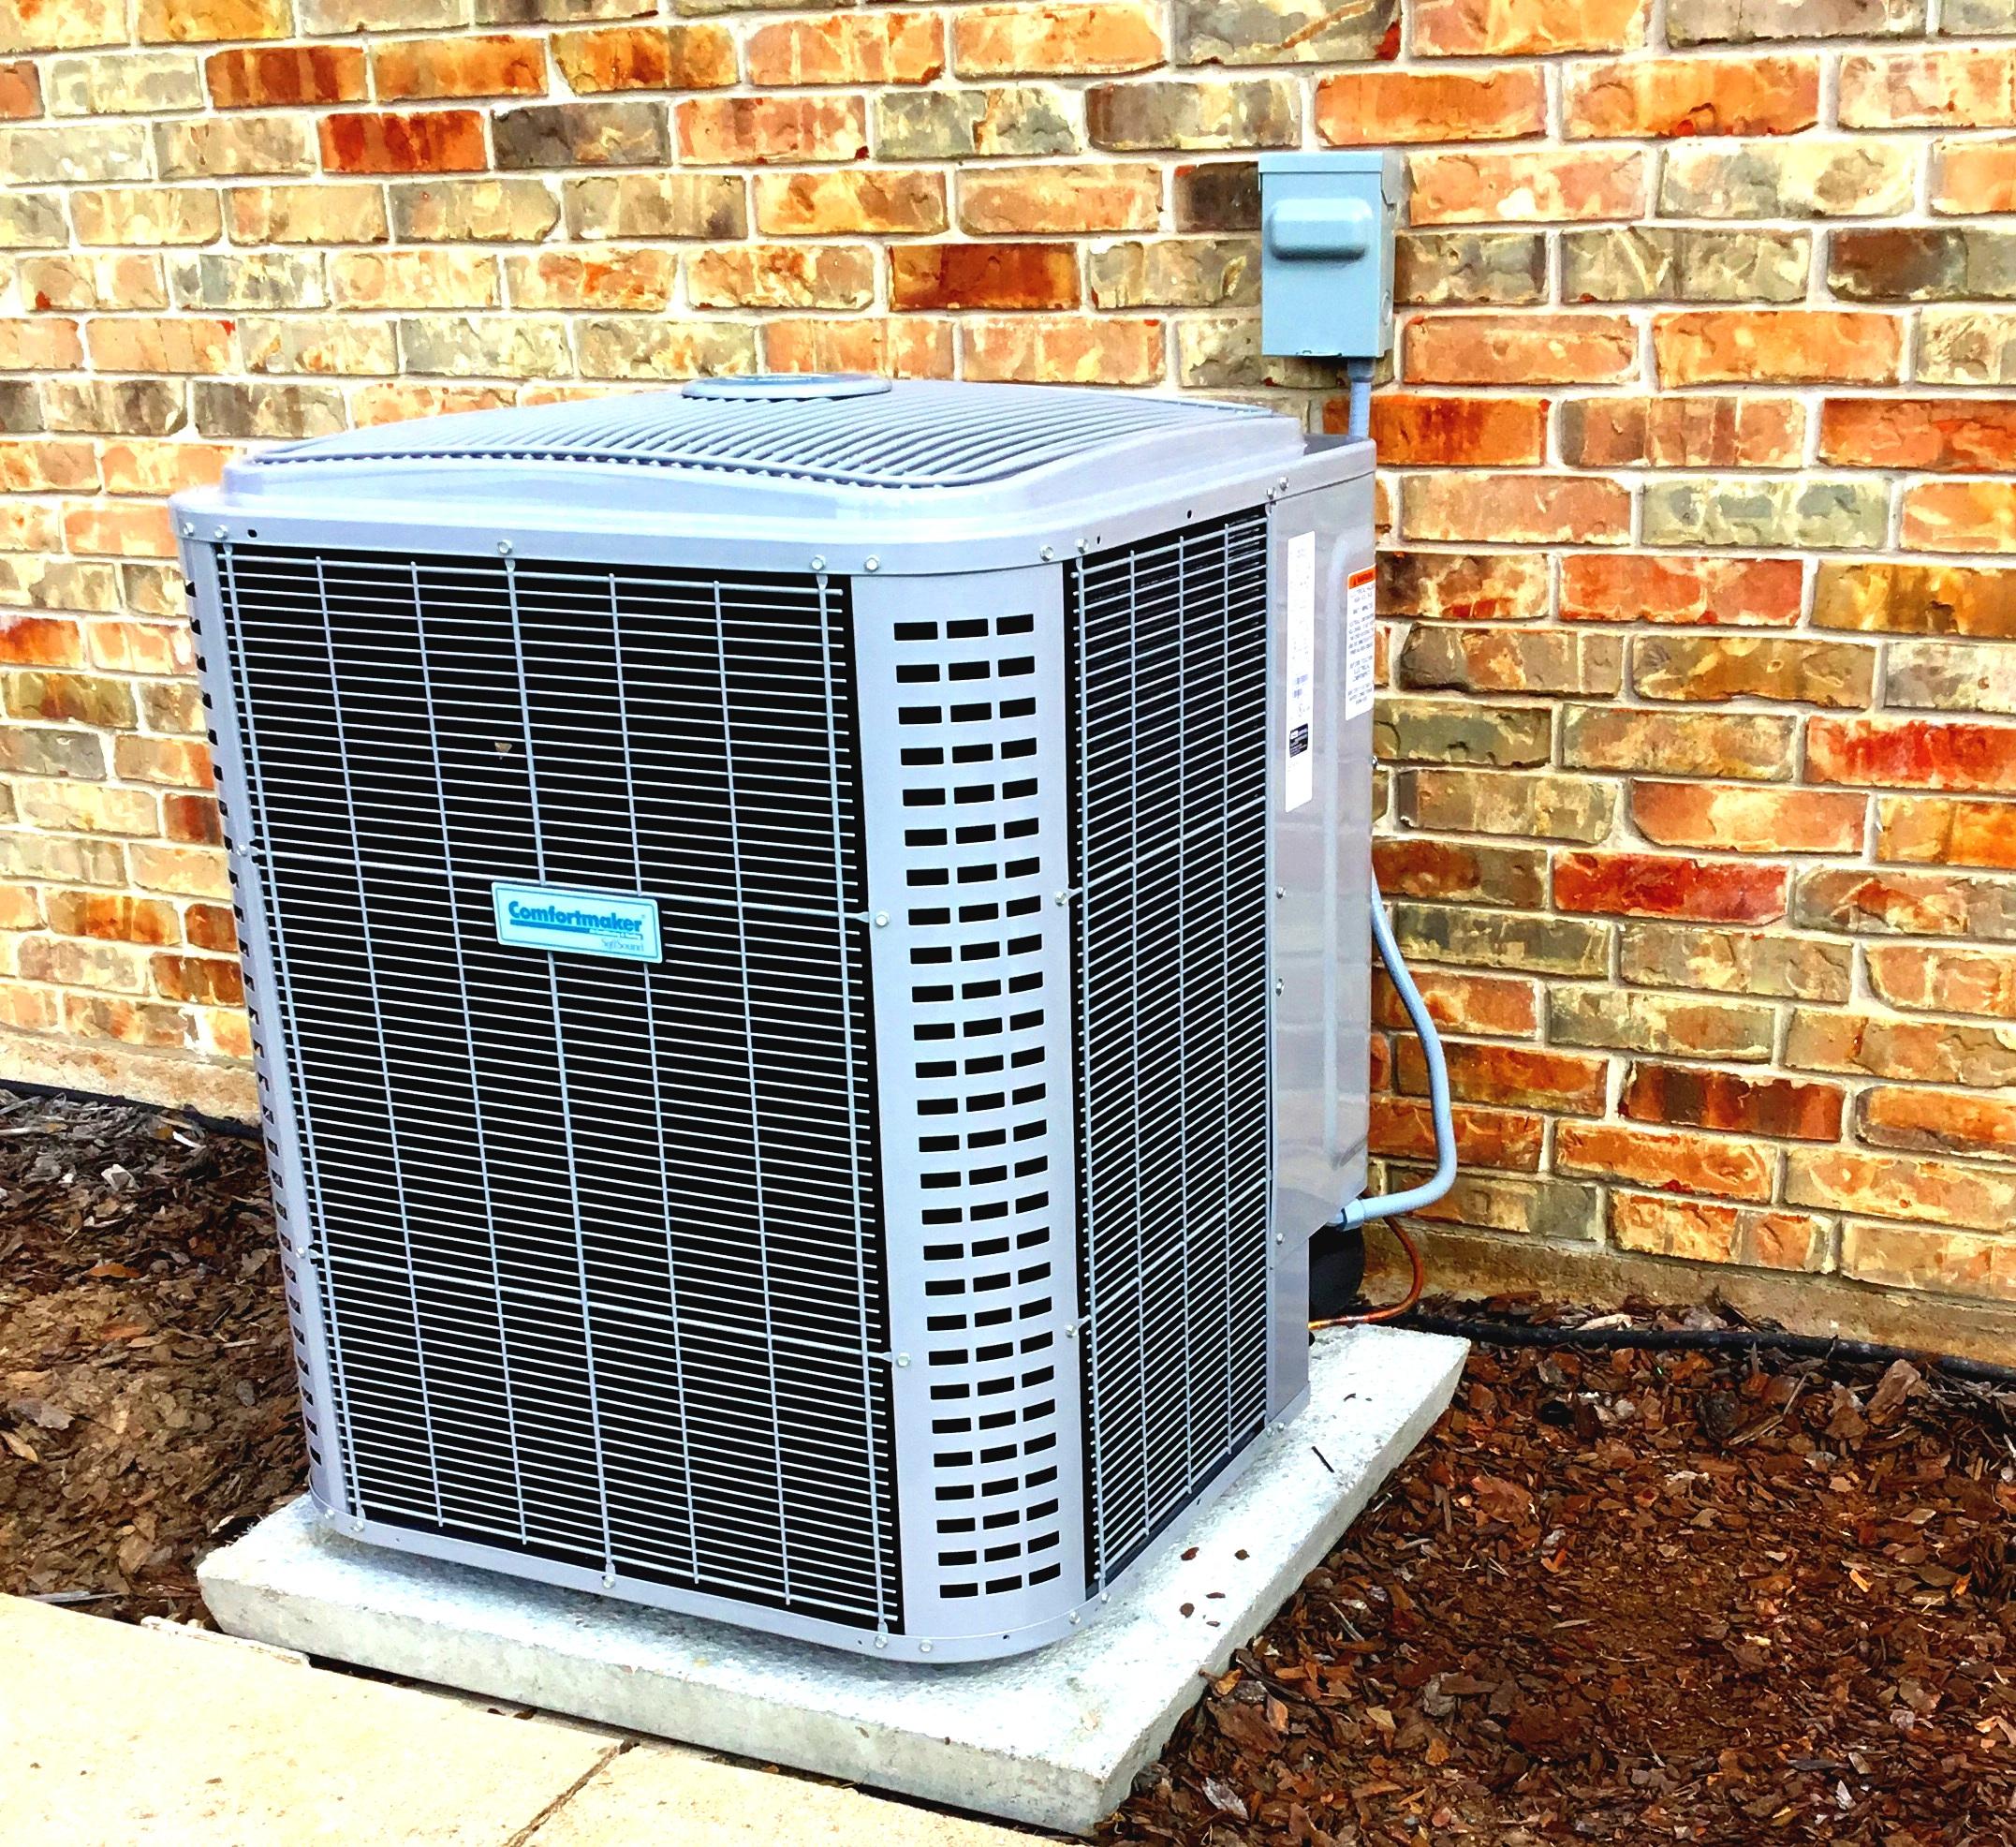 Comfortmaker 18 SEER Inverter A/C and Heat Pump College Station, Texas